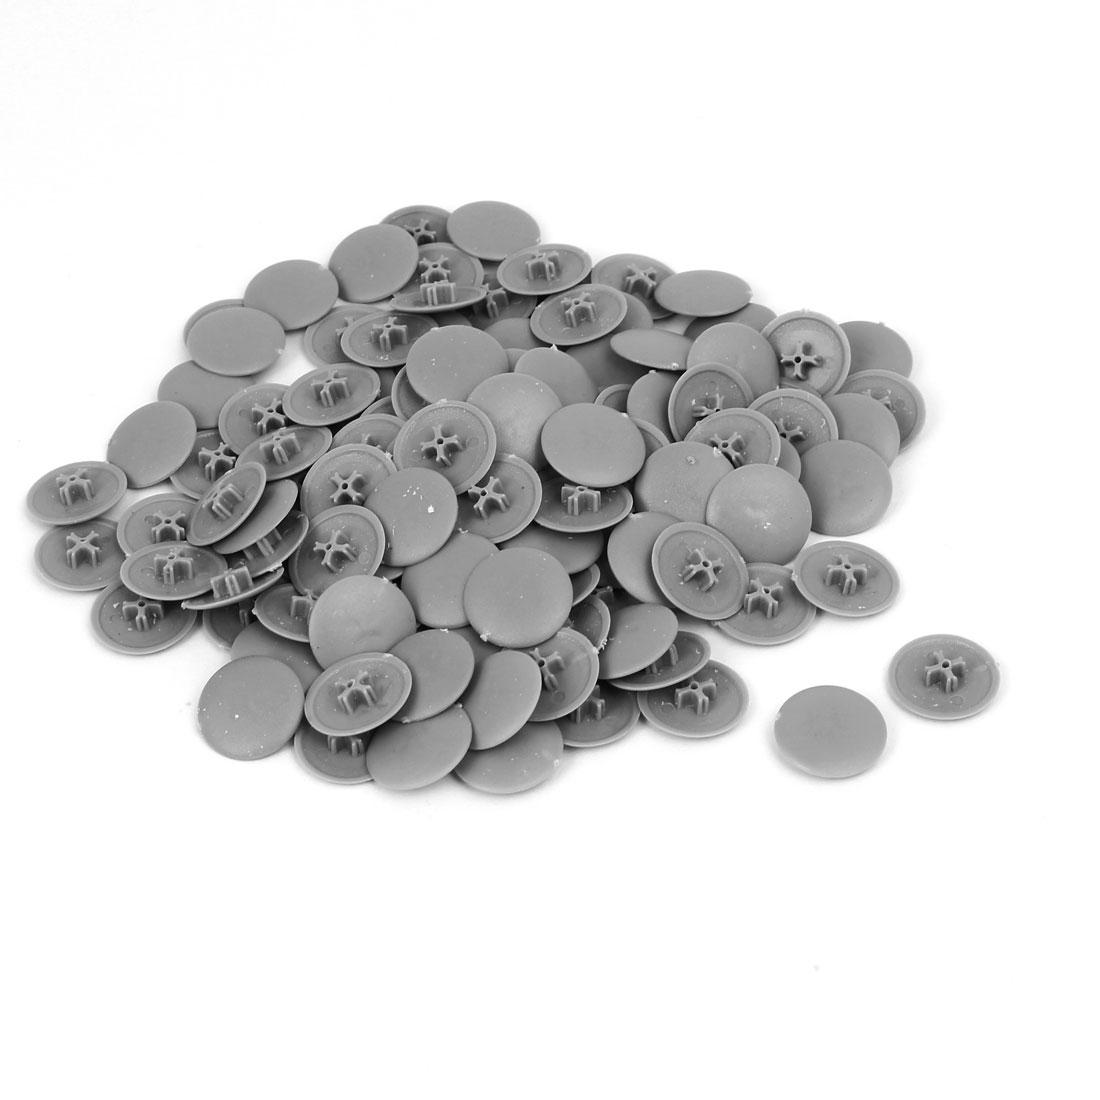 6mm Phillips 17mm Head Dia Screw Plastic Cap Cover Gray 100PCS